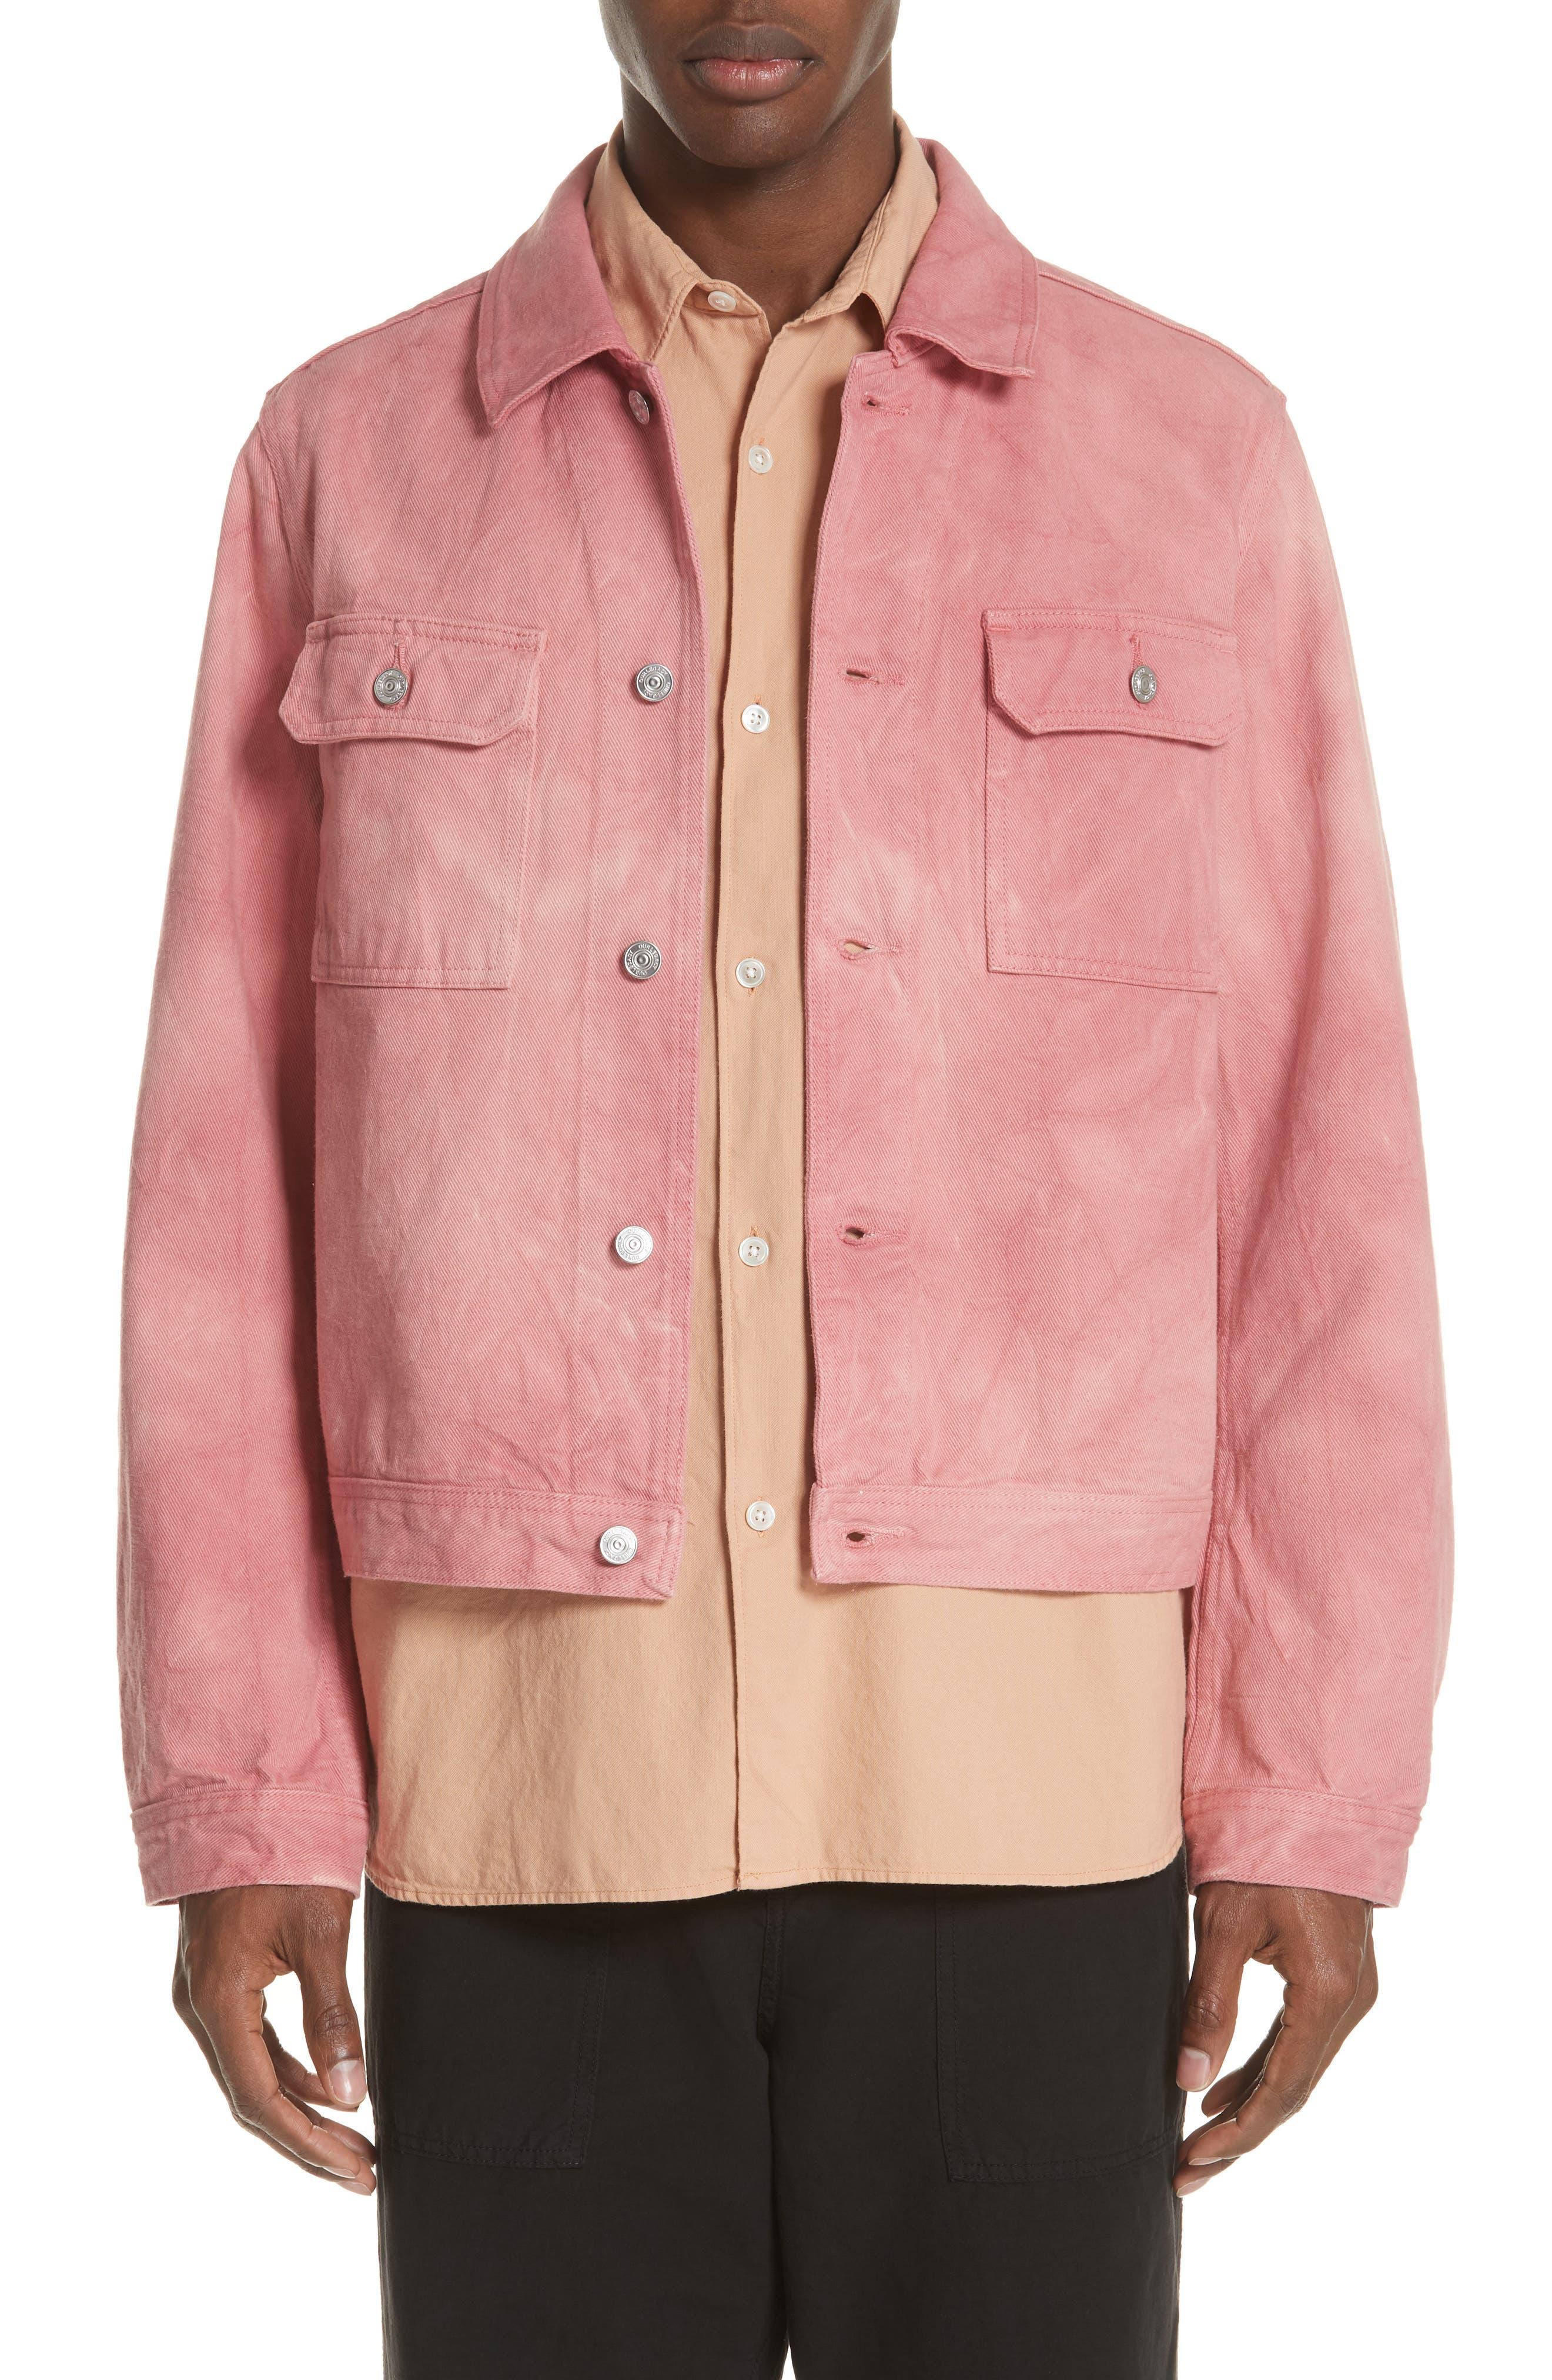 Dye Jacket,                             Main thumbnail 1, color,                             Pink